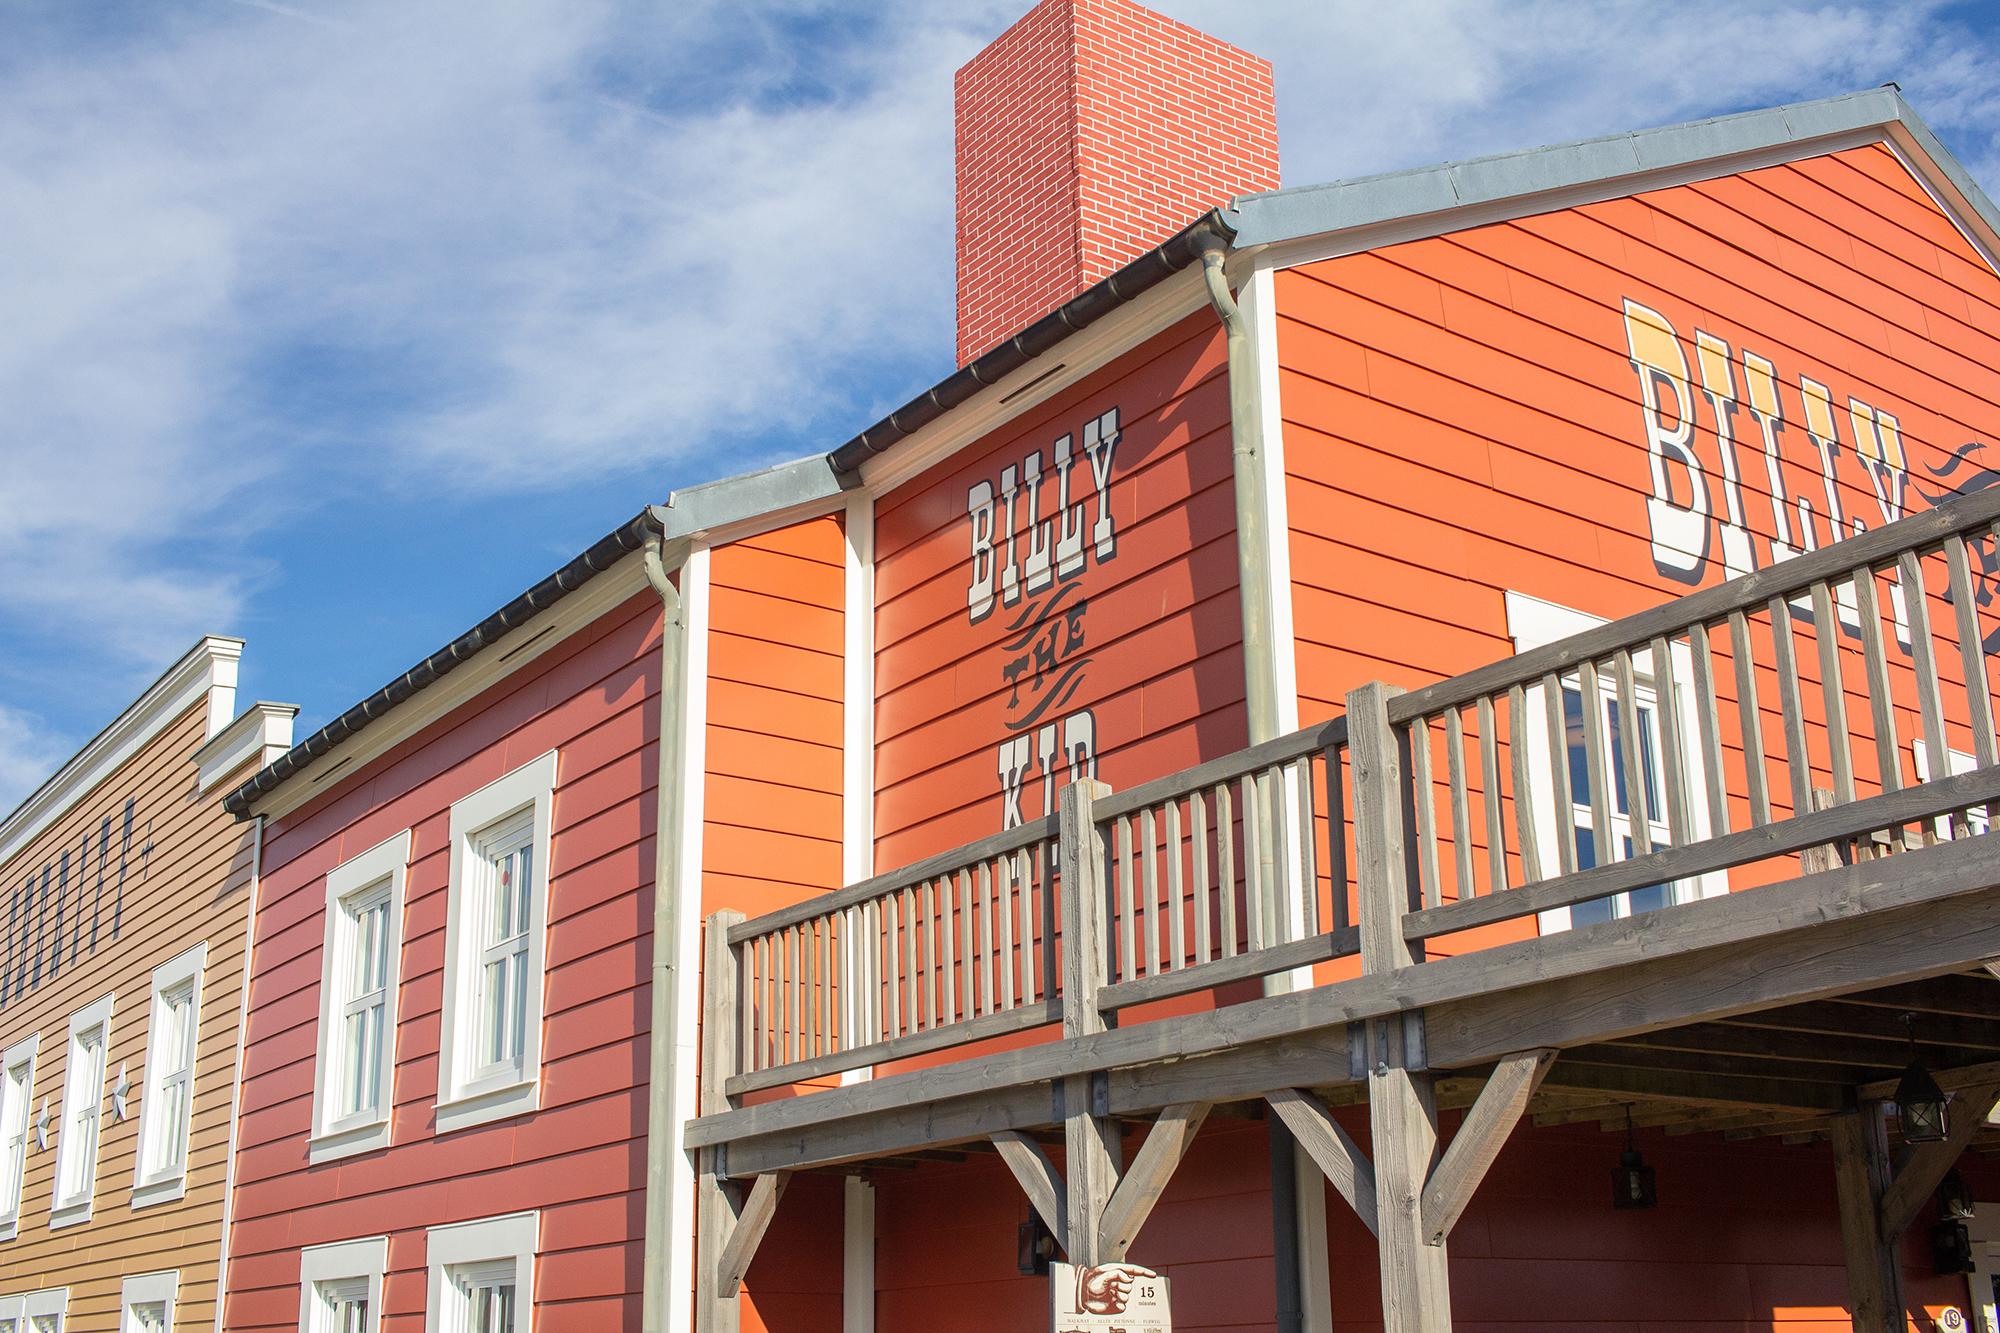 Orange building with Billy the Kid written on it. | Staying at Hotel Cheyenne in Disneyland Paris